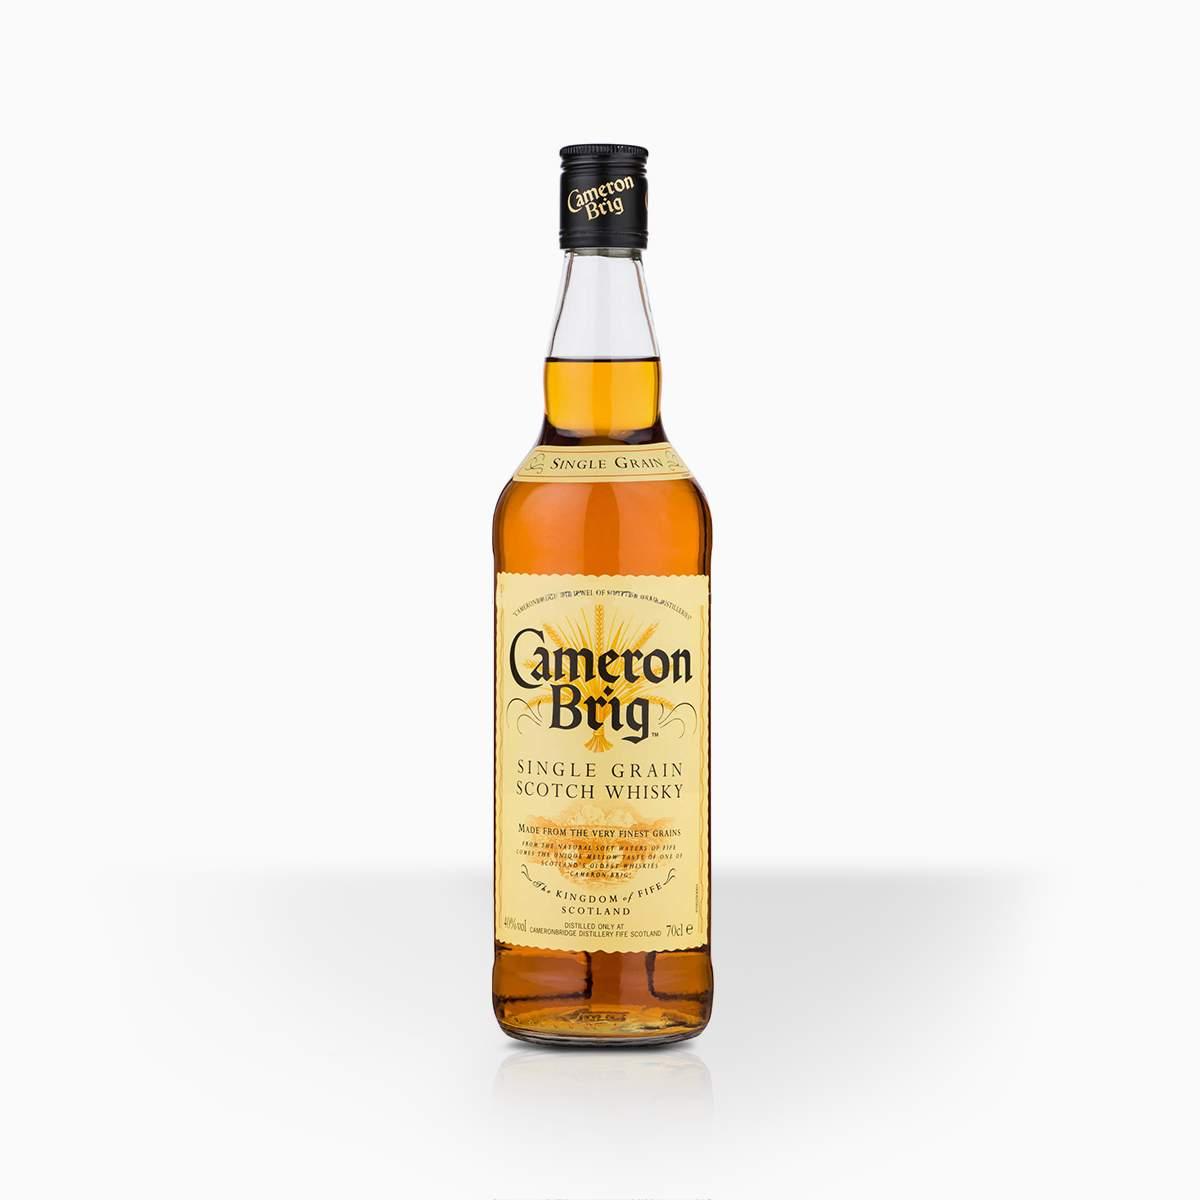 #2490 Whisky Cameron Brig 40% 0,7l